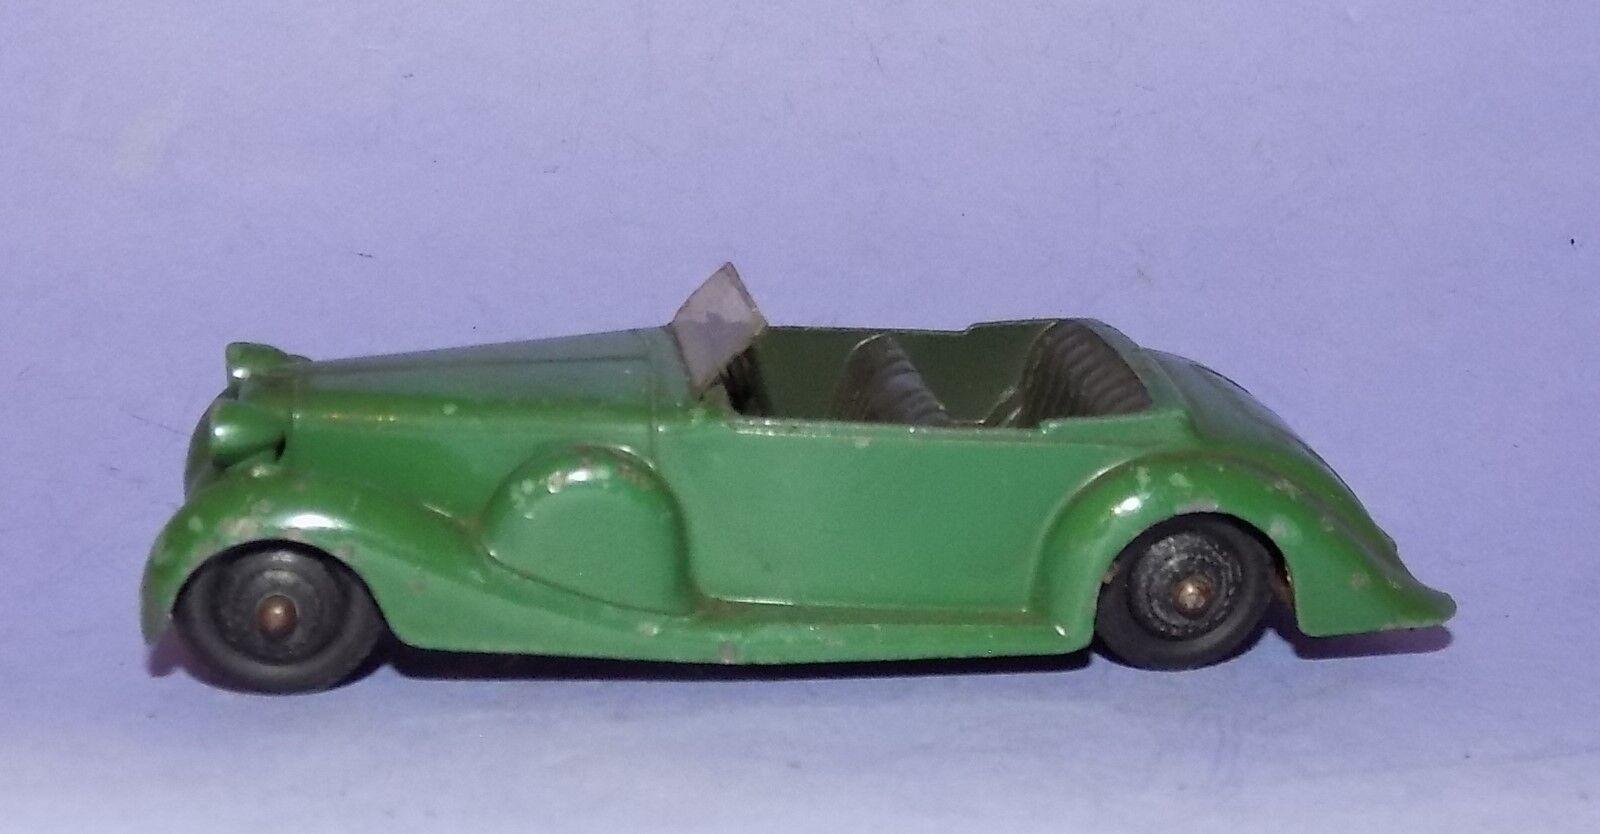 VINTAGE  1946 - 1955  DINKY TOYS  NO 38C  GREEN LAGONDA  LOT 2